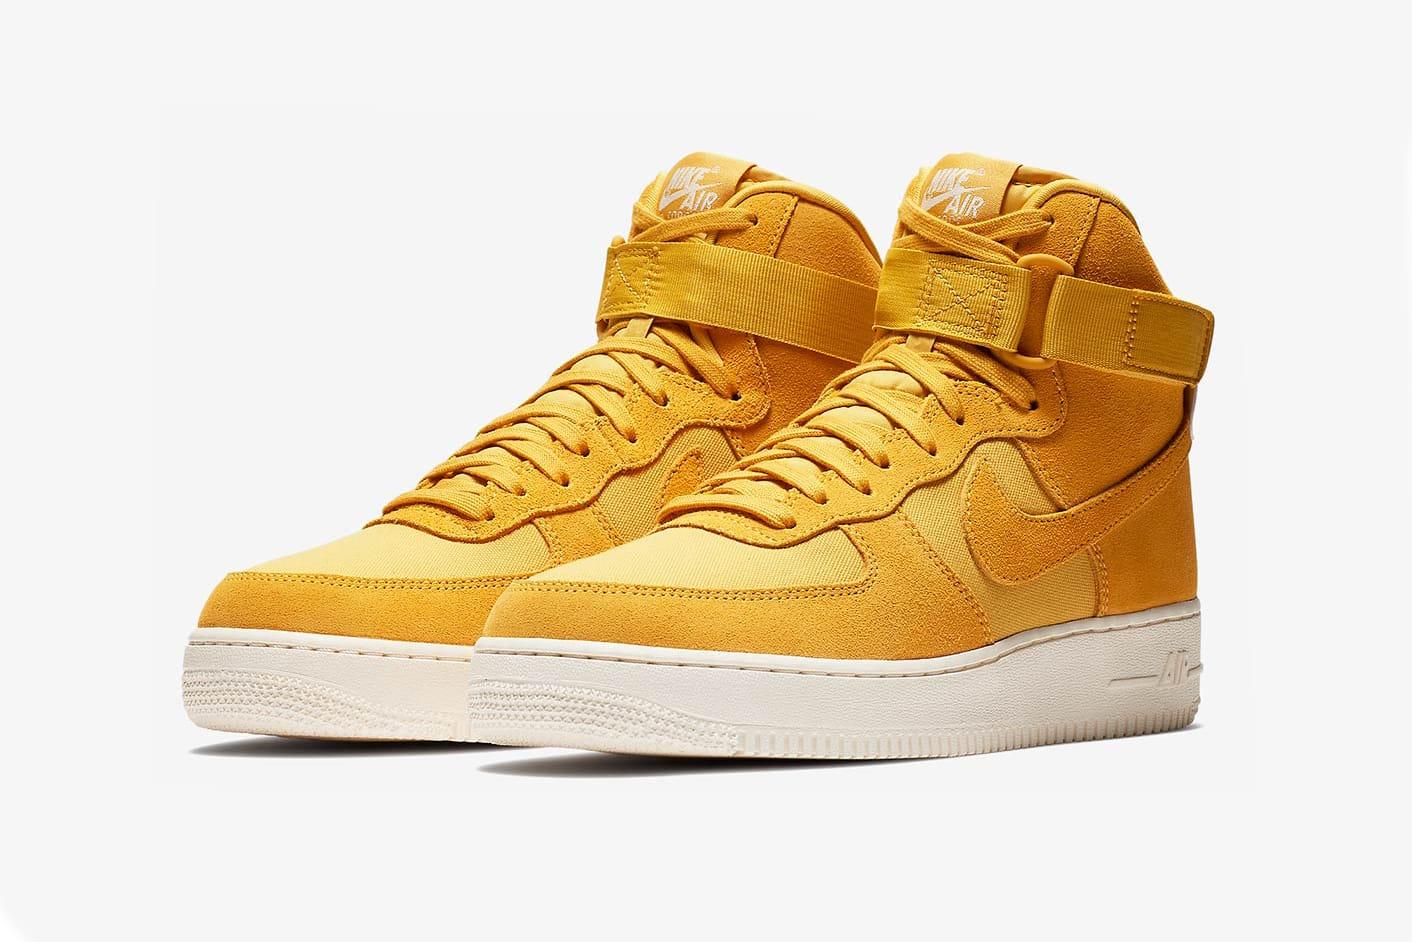 Nike's Air Force 1 Hi Suede Gets Three